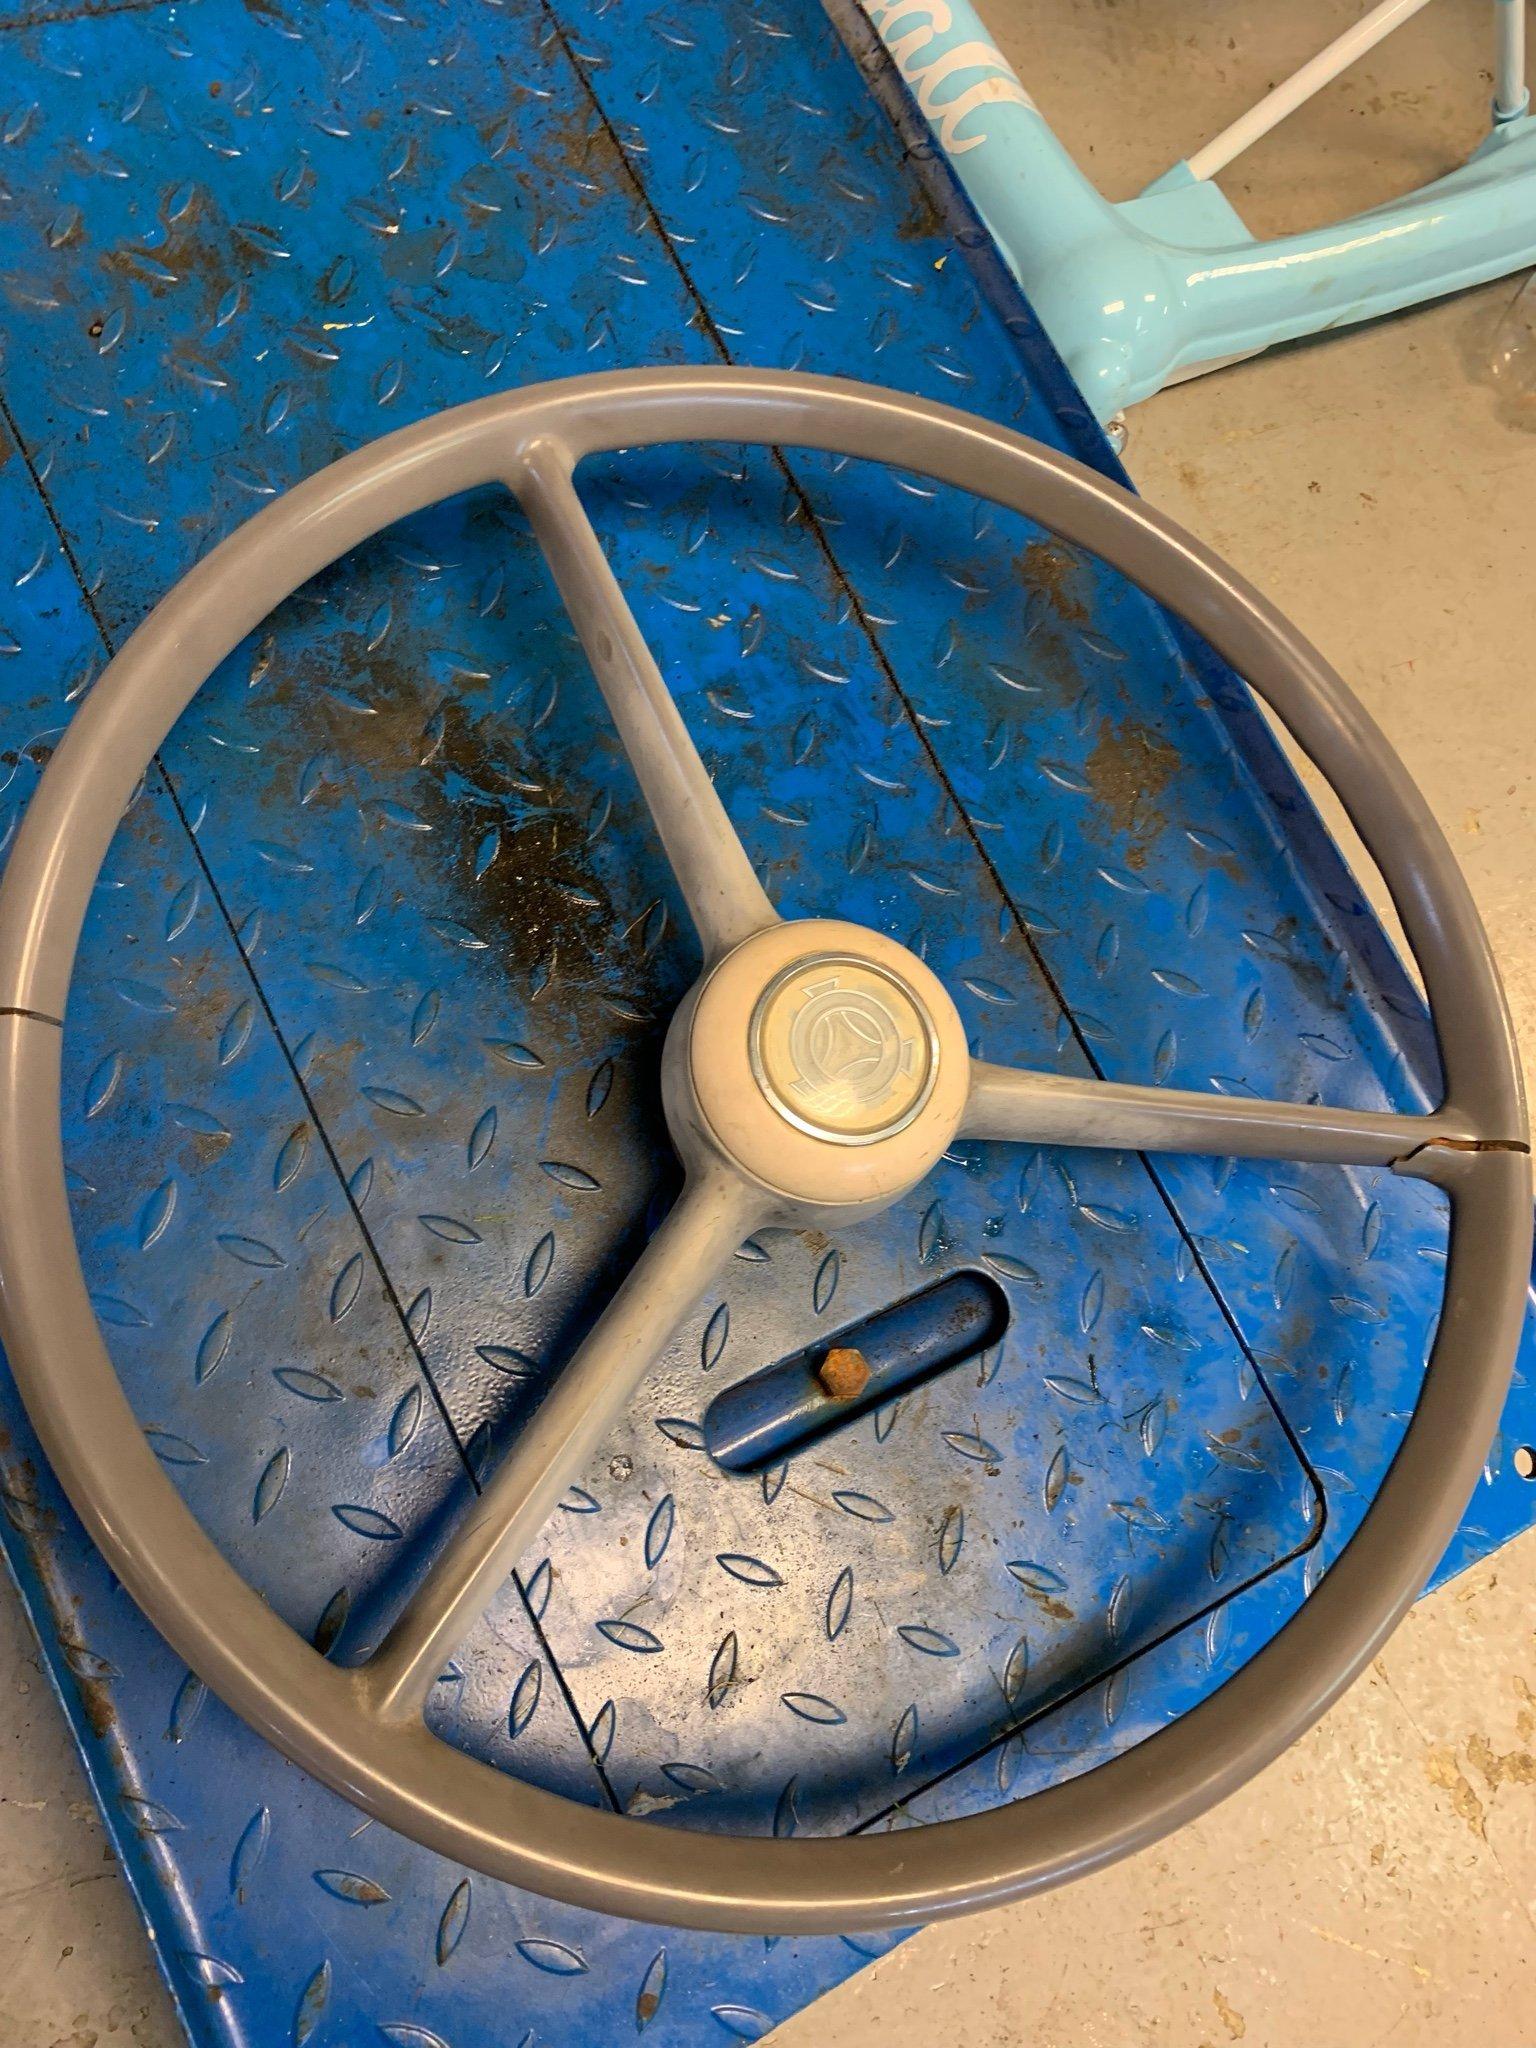 Scania Orginal Bakelitratt 368237512 ᐈ Kop Pa Tradera